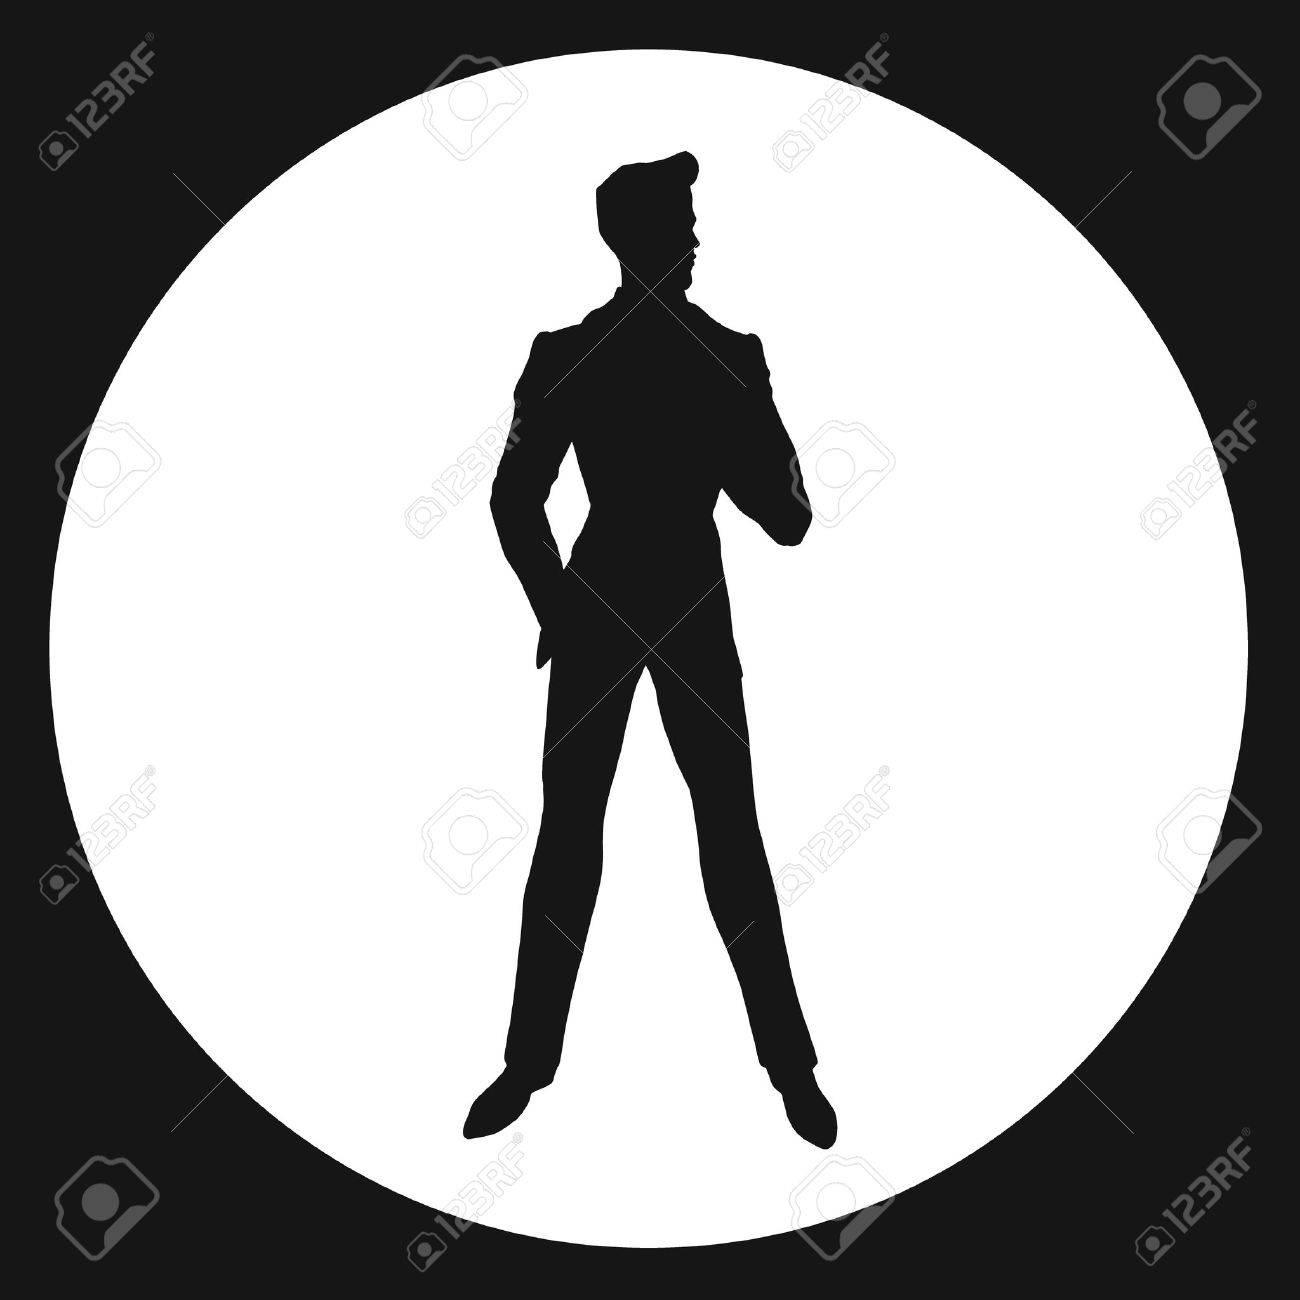 man. silhouette. James Bond.